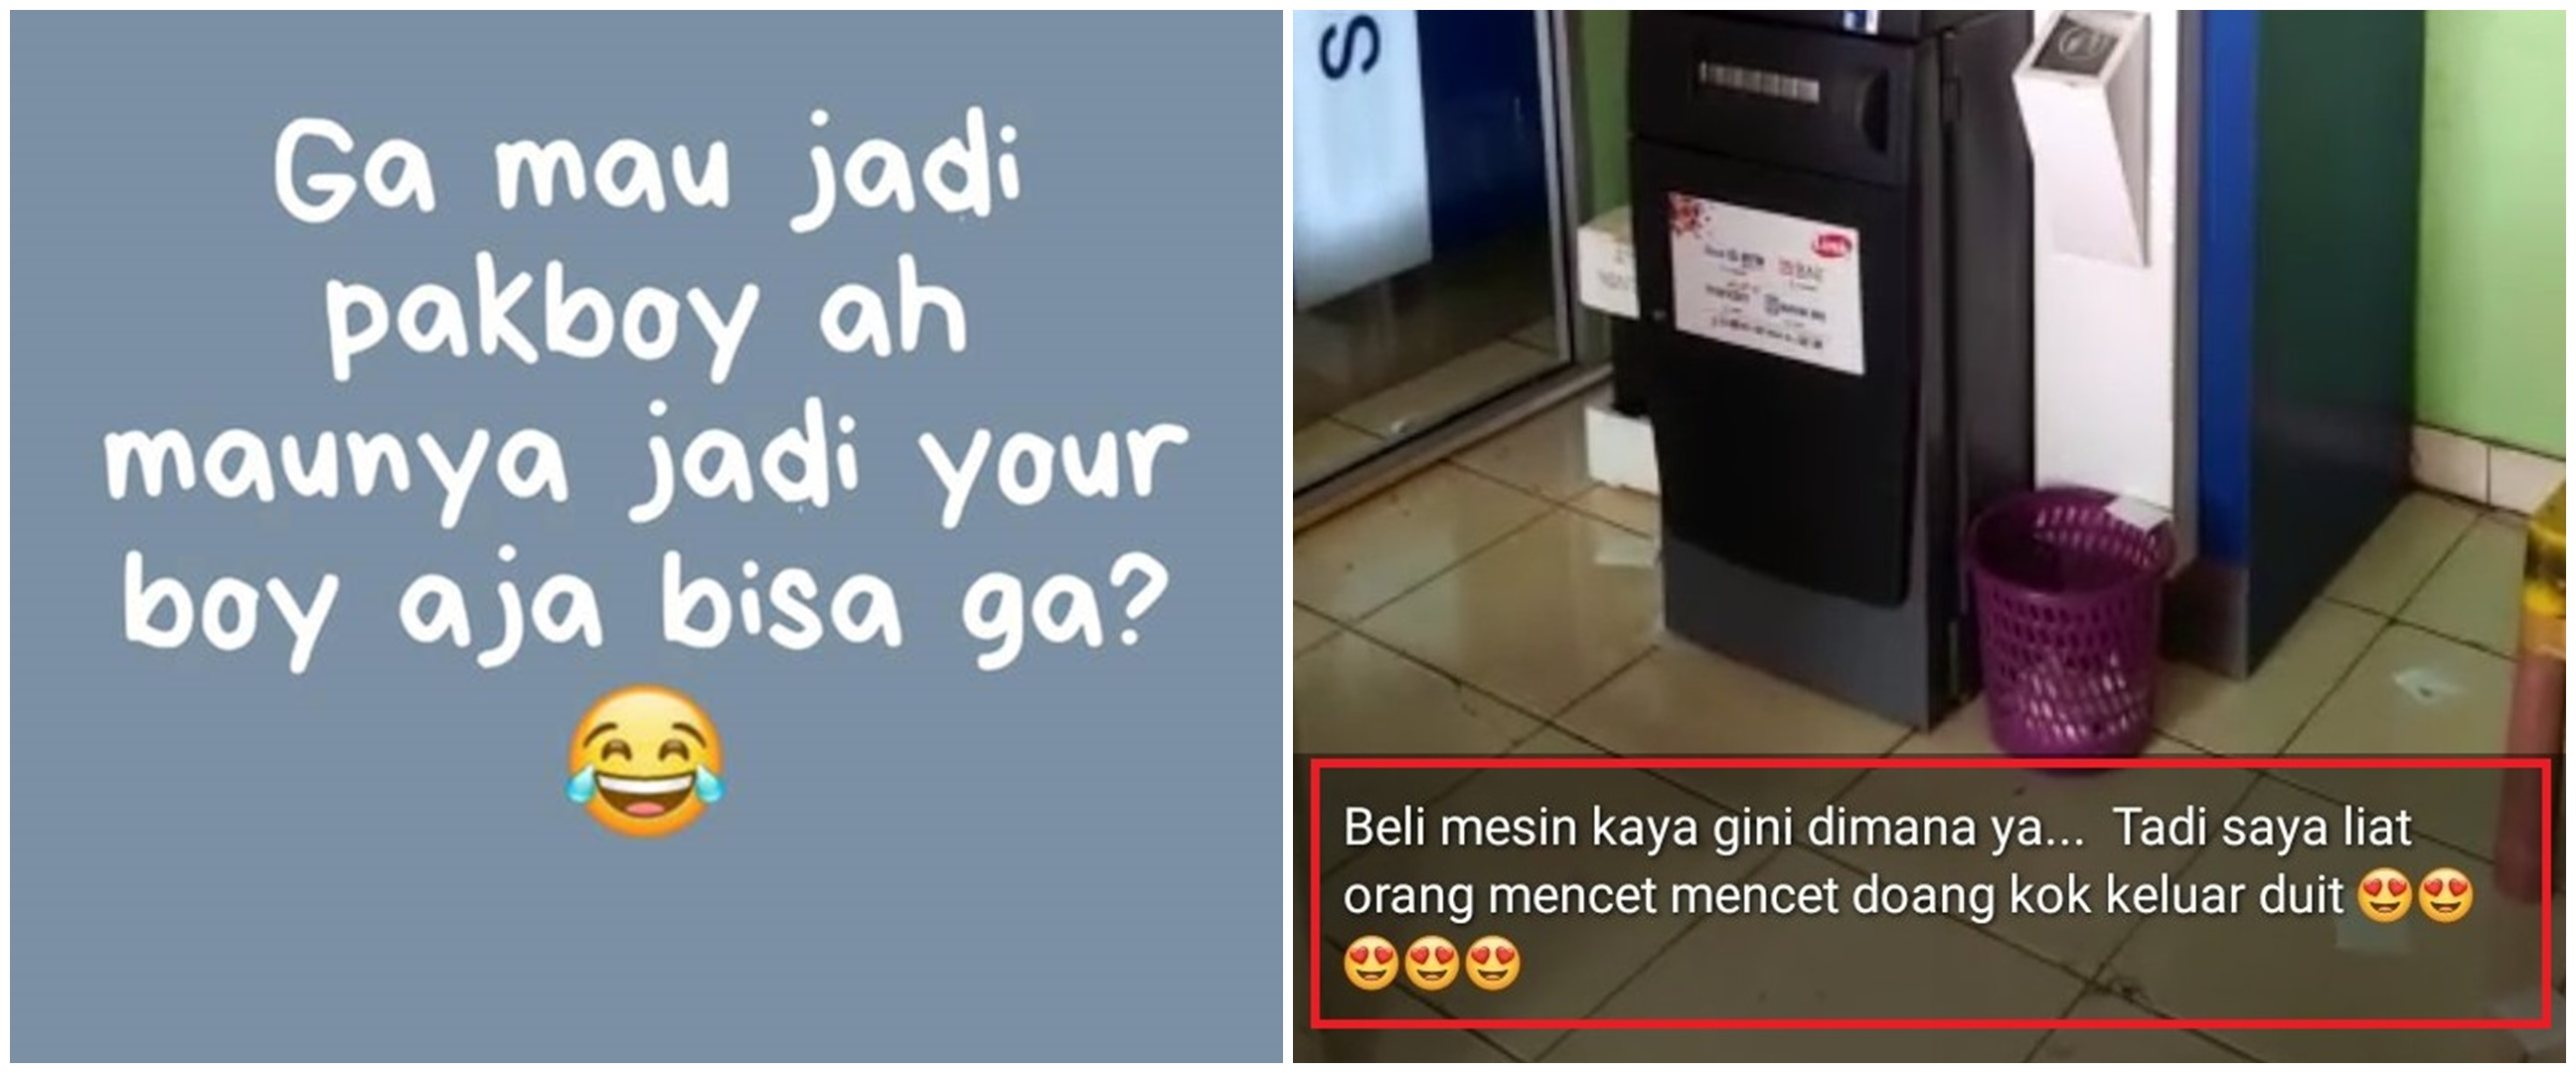 11 Pertanyaan di status WhatsApp lucunya bikin ketawa garing